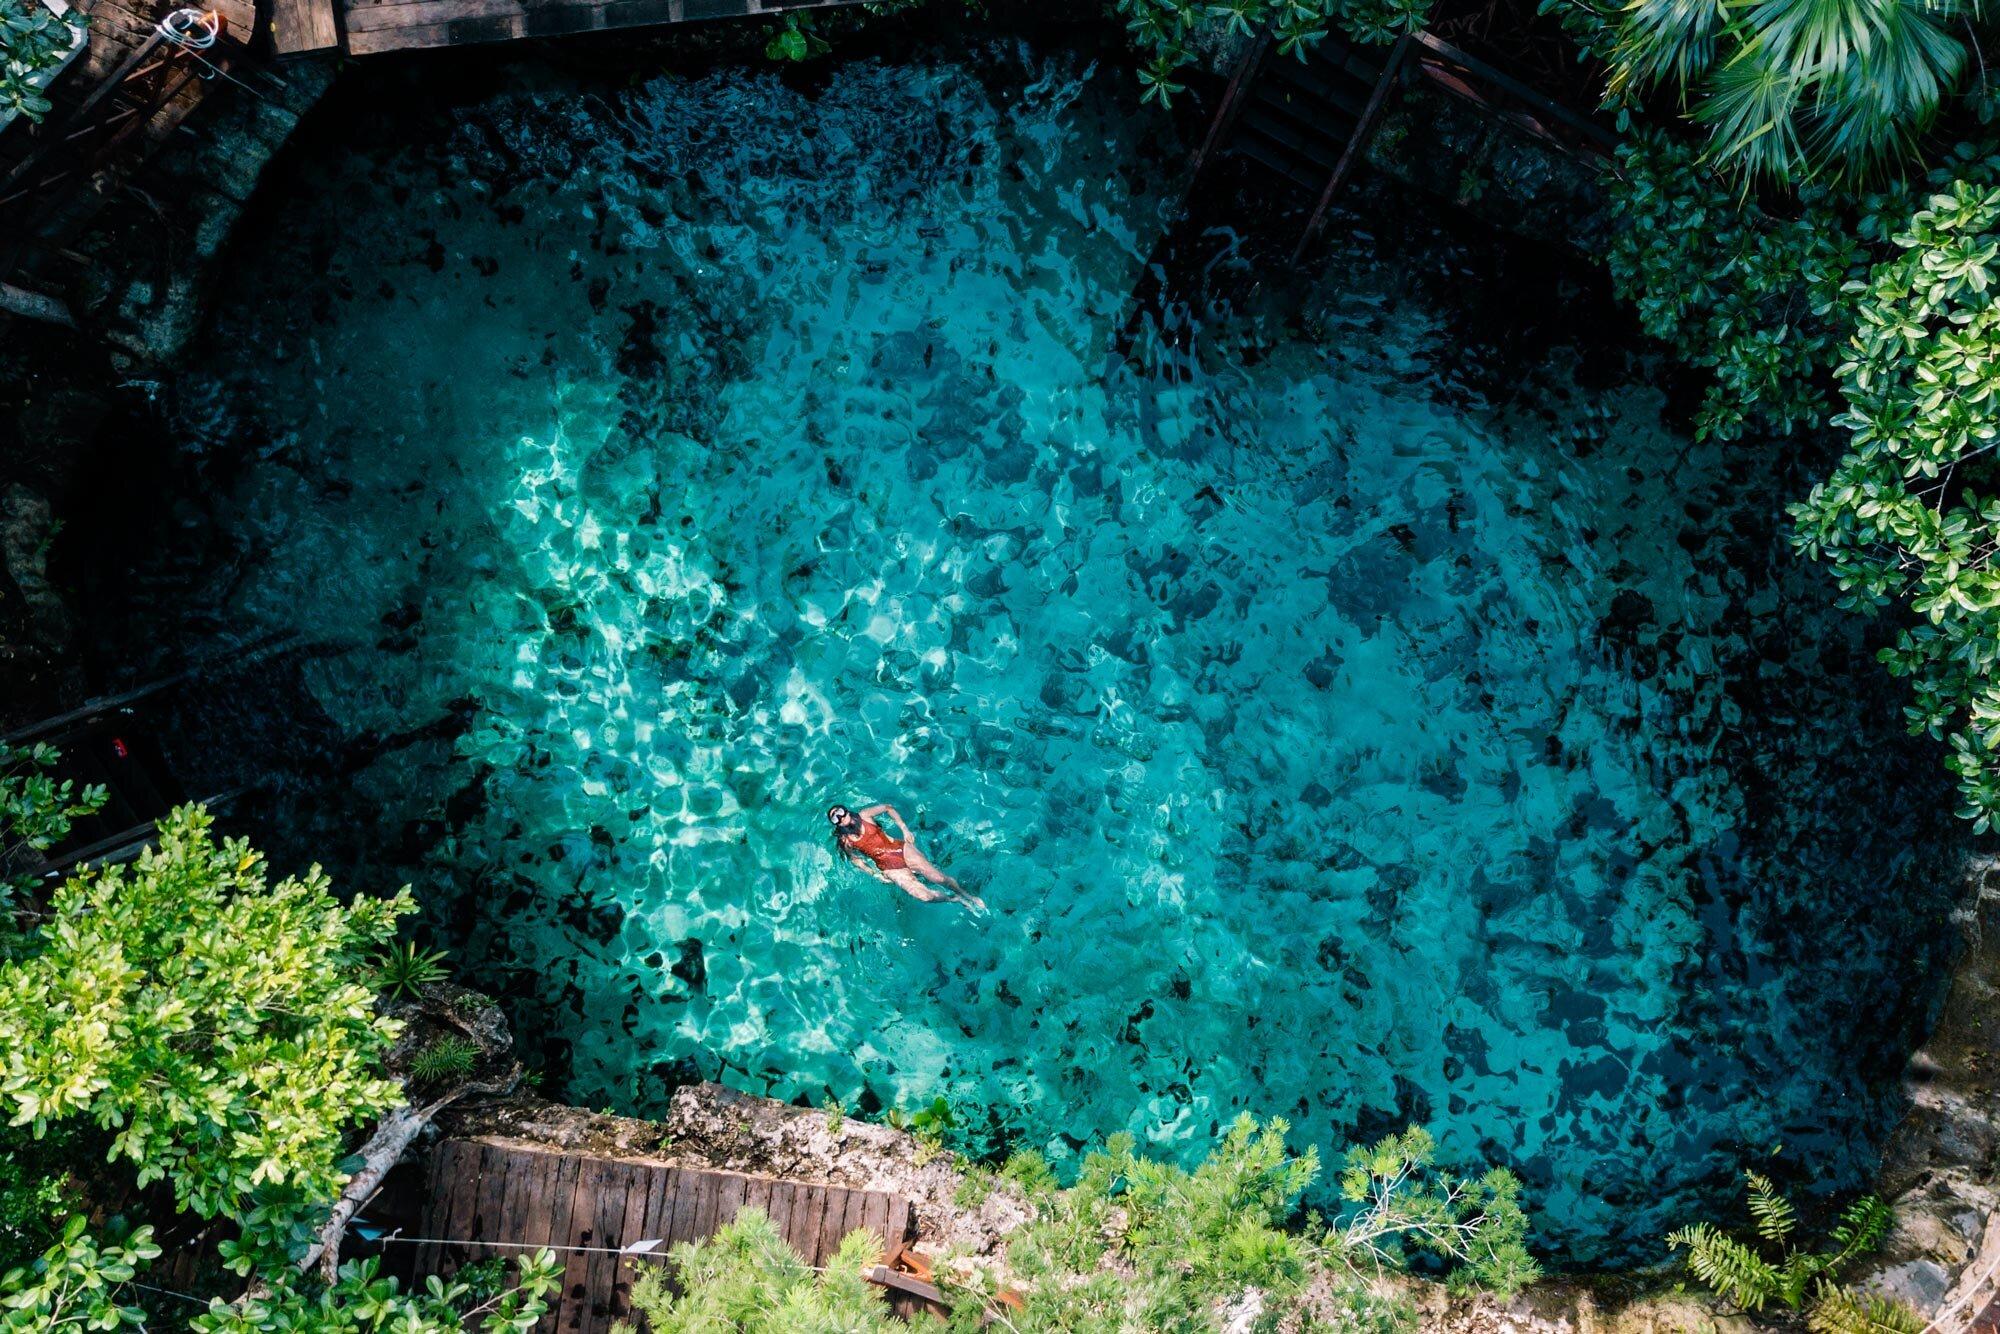 Rachel Off Duty: A Woman Floating in Cenote Zacil-Ha, Tulum, Mexico